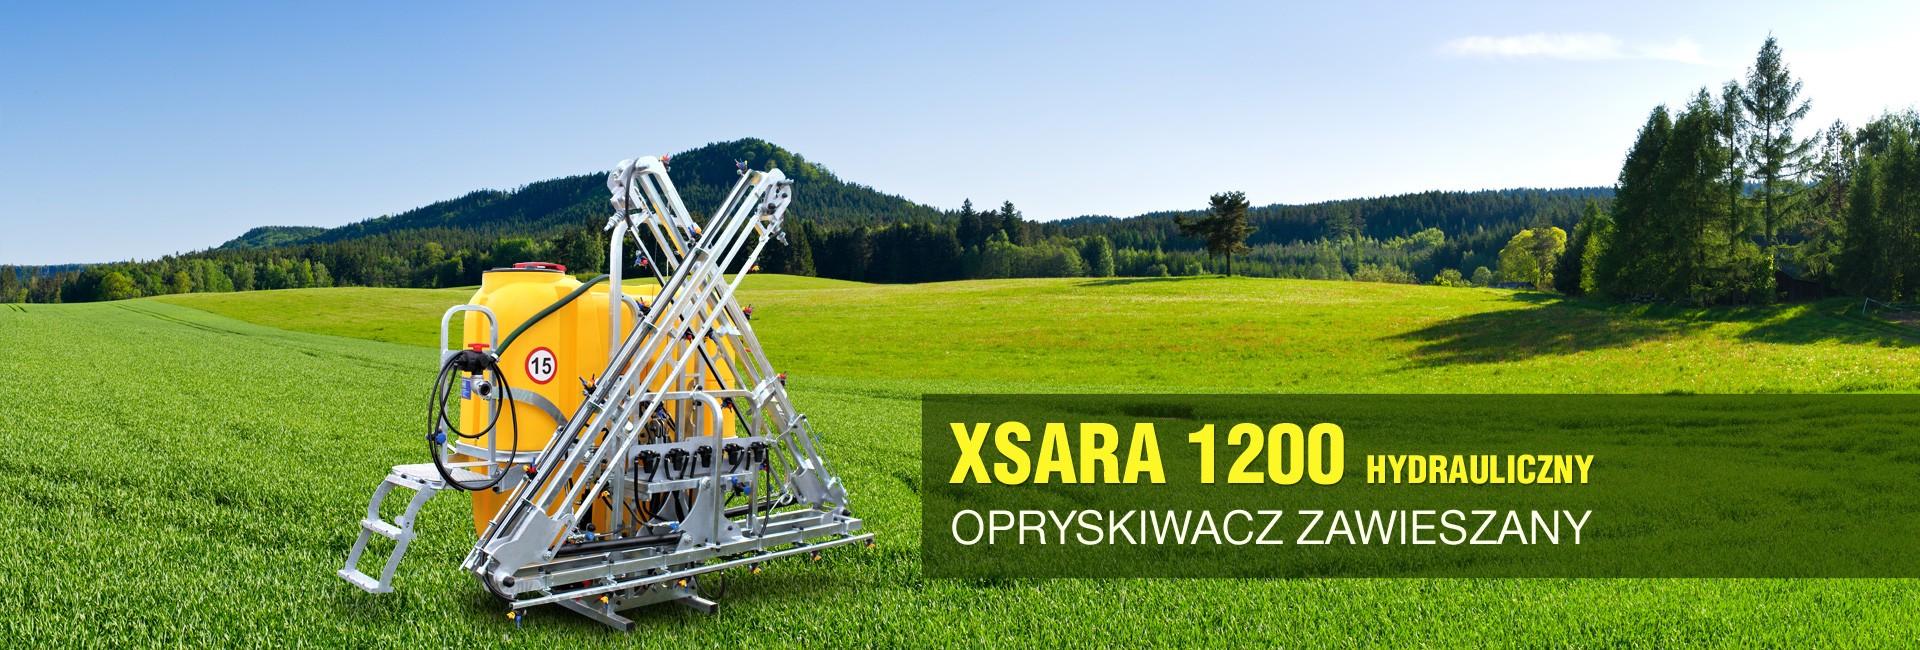 XSARA 1200 LITRÓW